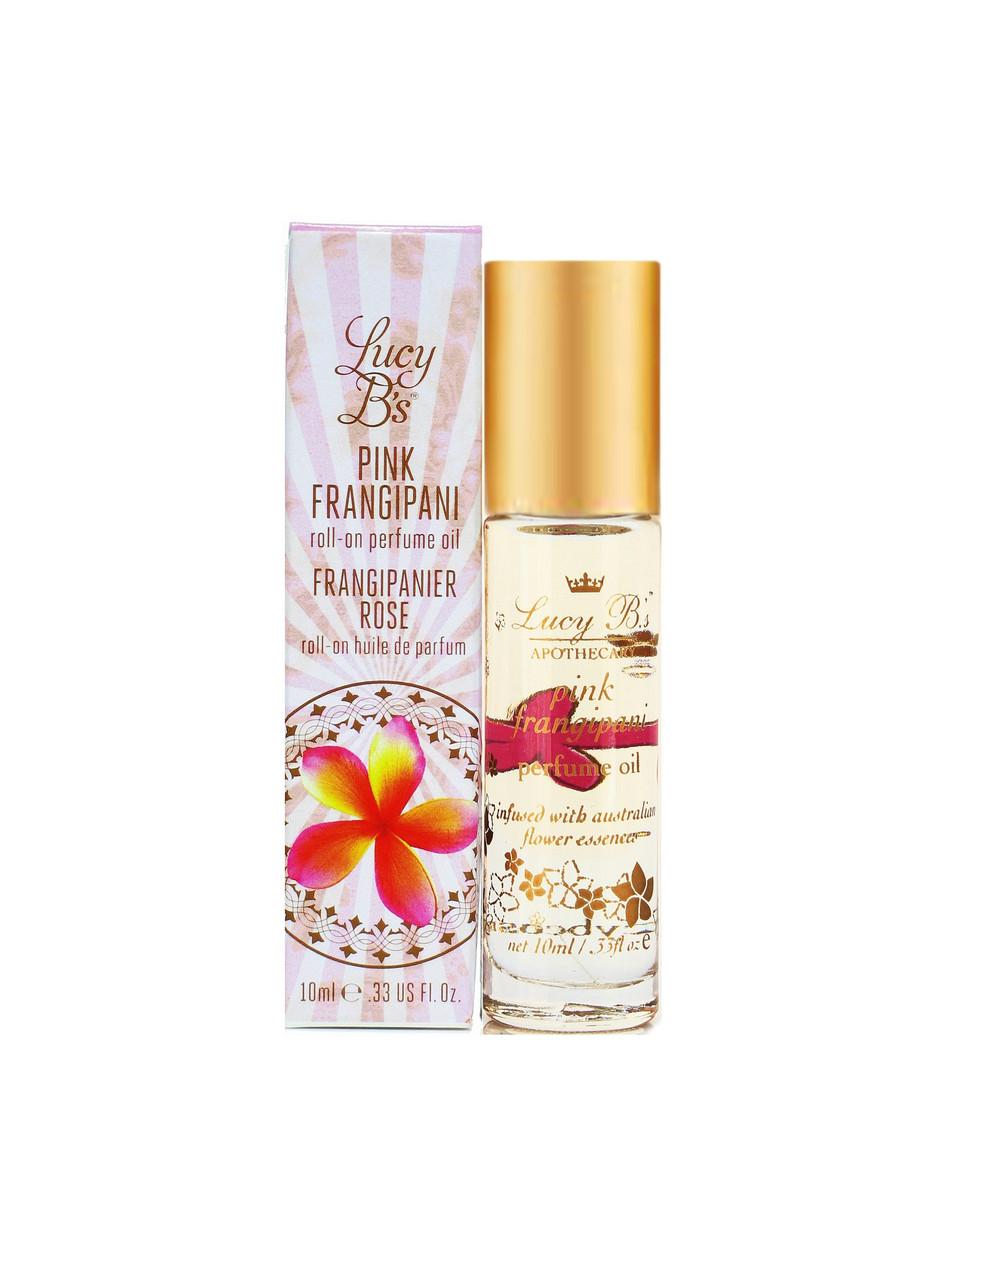 Lucy B's Pink Frangipani Roll-On Perfume Oil 10 mL